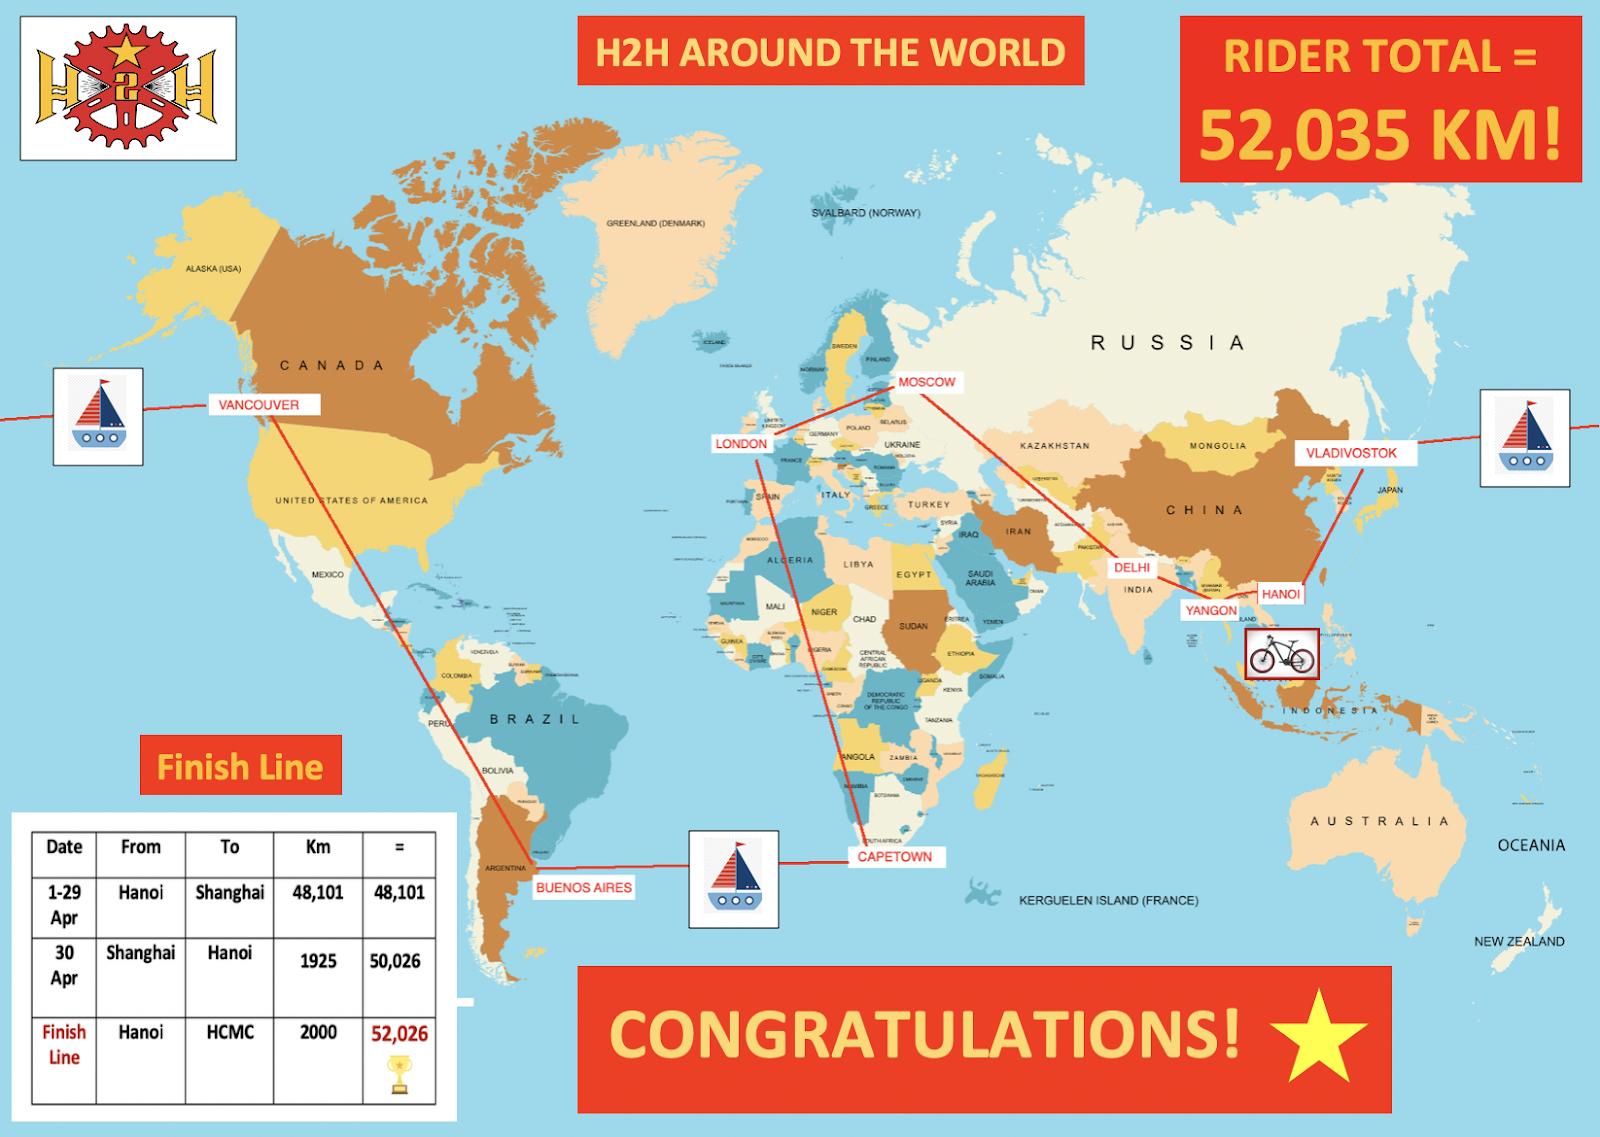 h2h around the world virtual ride raises funds for underprivileged children